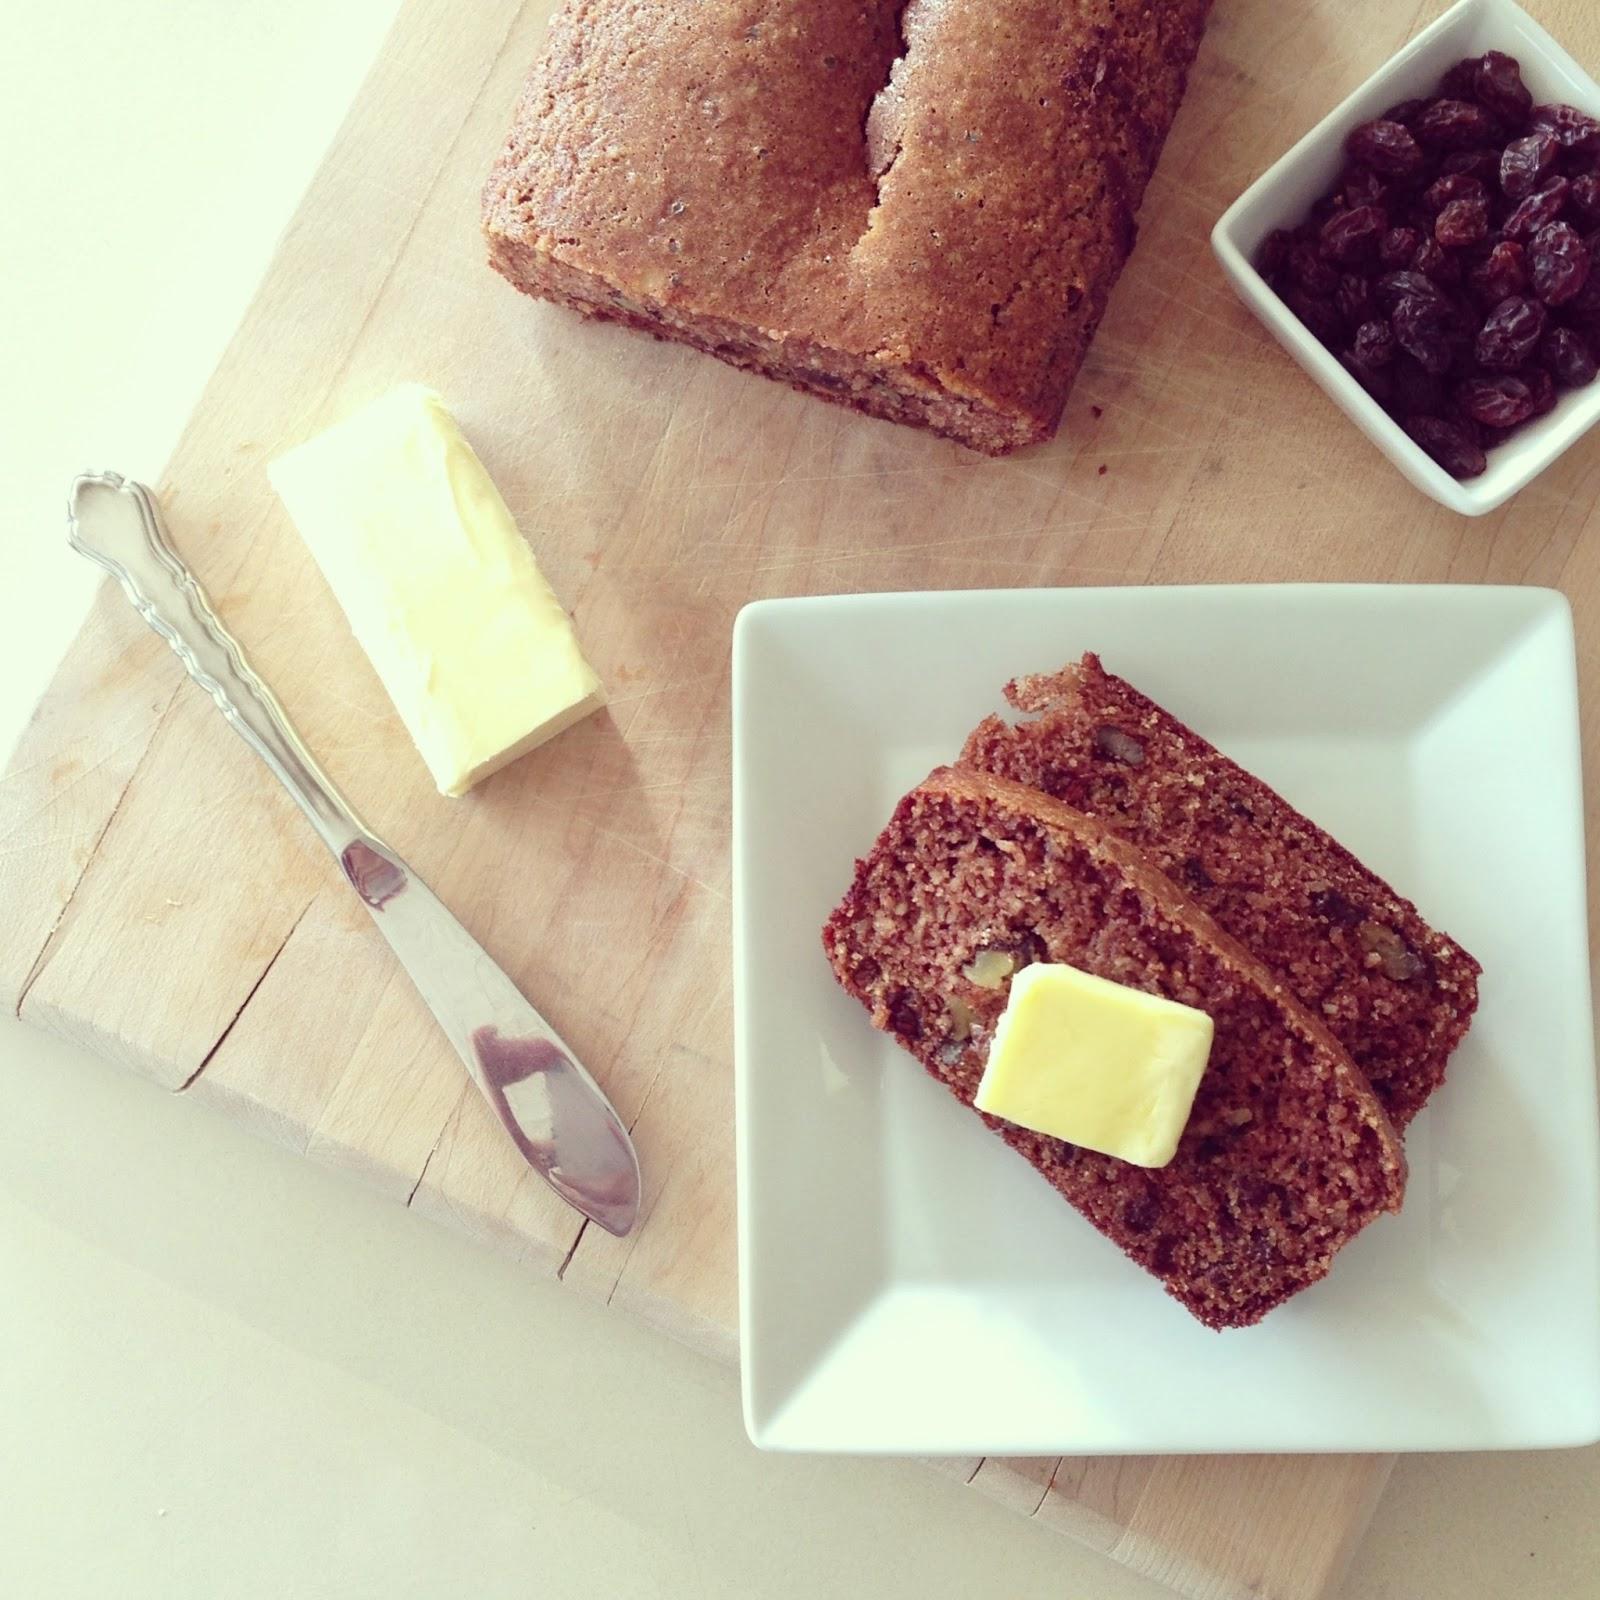 32. Cinnamon Raisin Bread